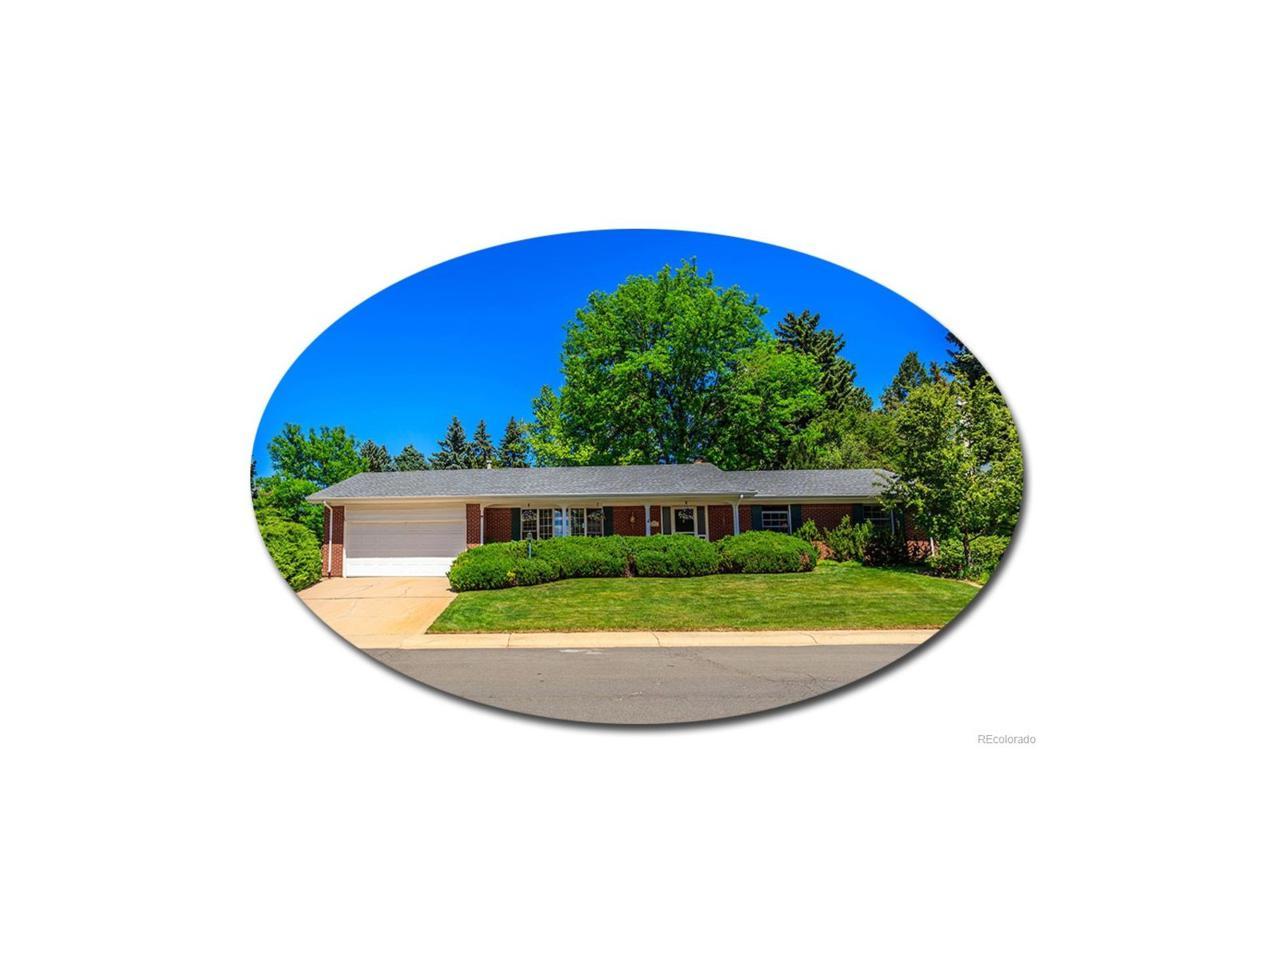 6802 S Clayton Way, Centennial, CO 80122 (MLS #9151081) :: 8z Real Estate